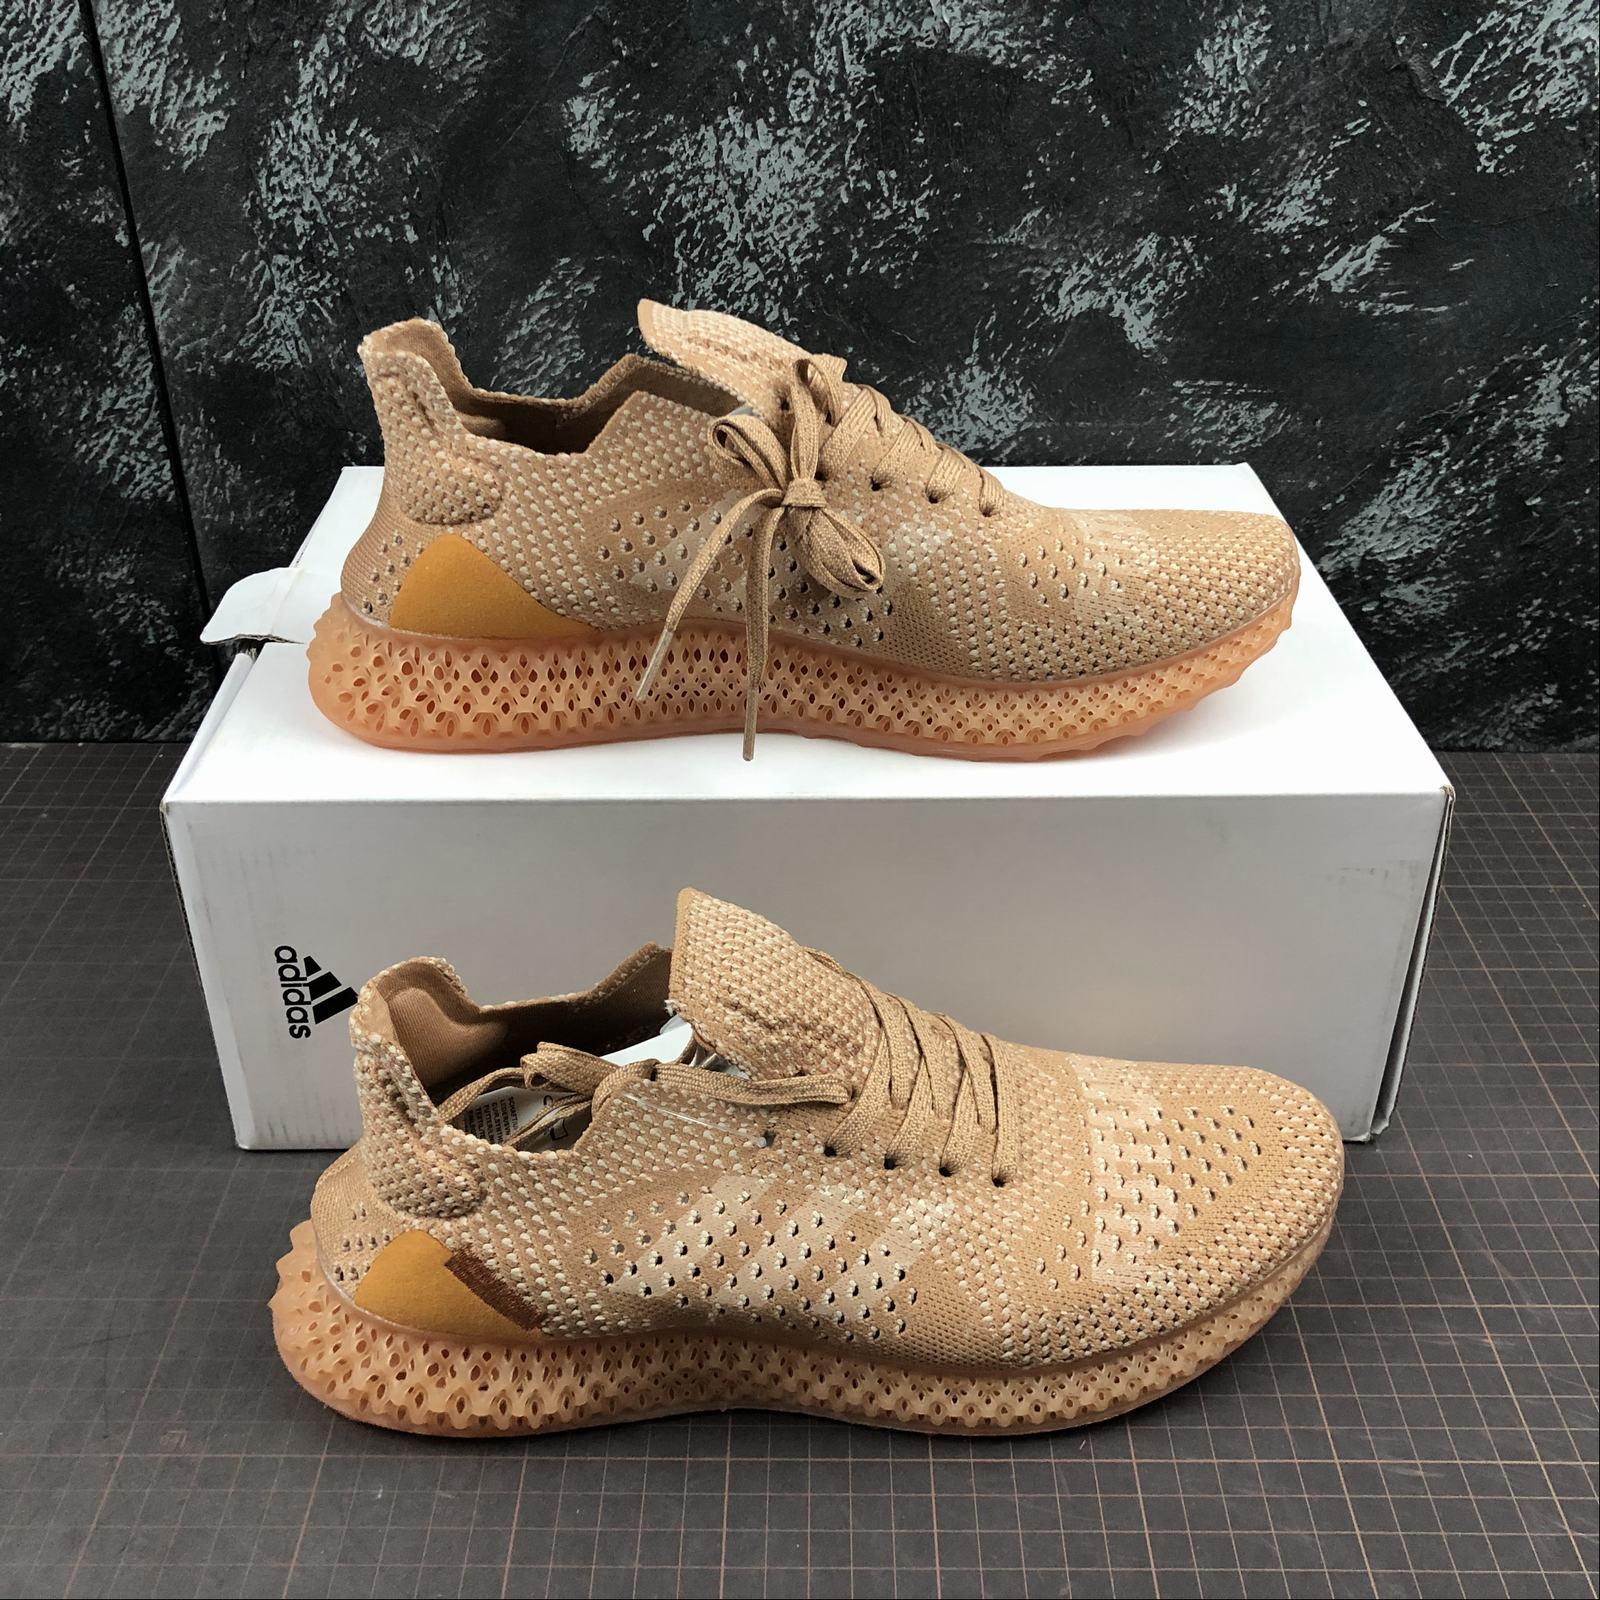 giay-sneaker-adidas-futurecraft-4d-b96619